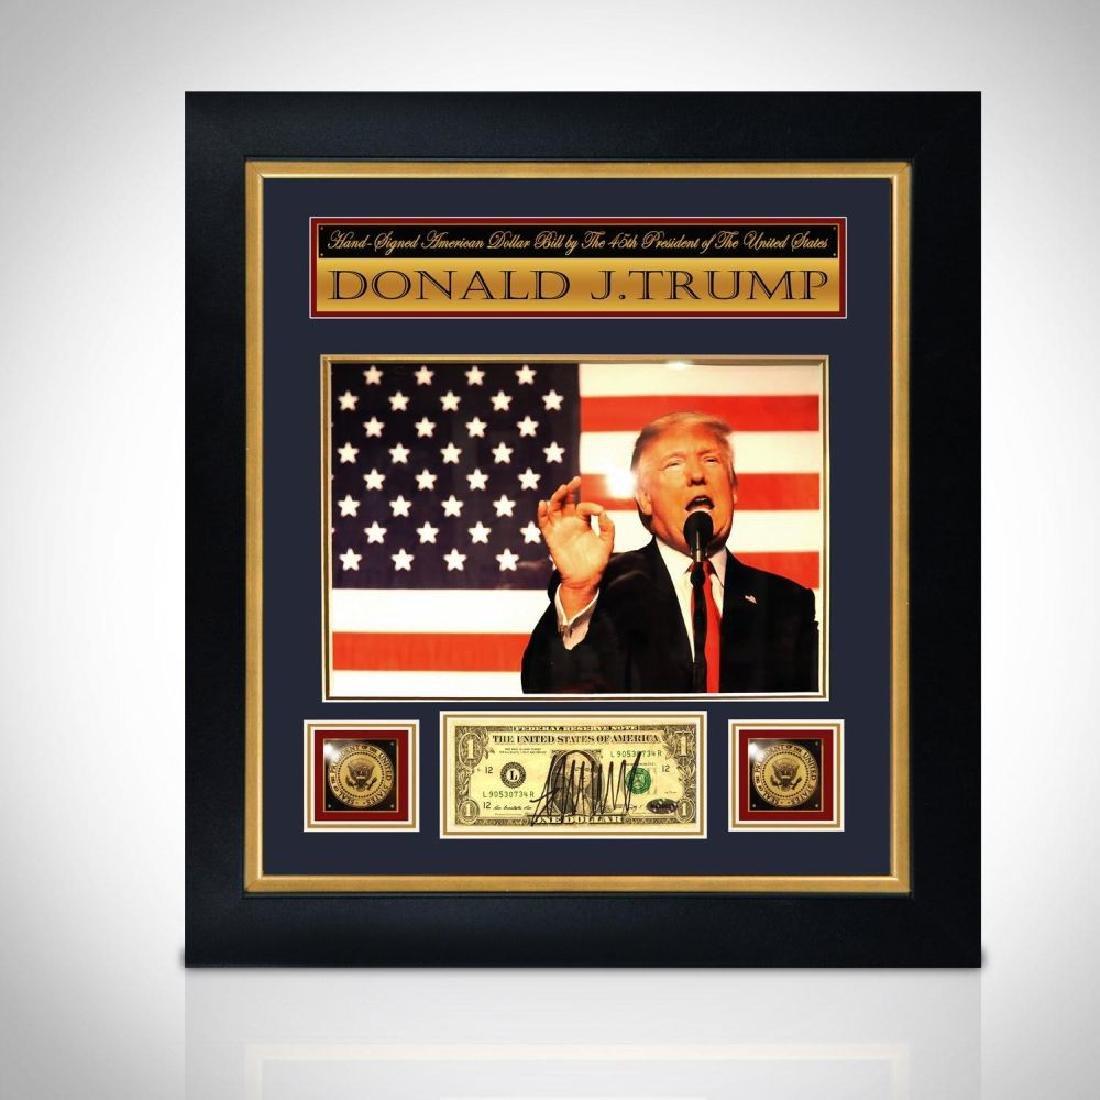 Donald Trump Signed Dollar Bill Collage